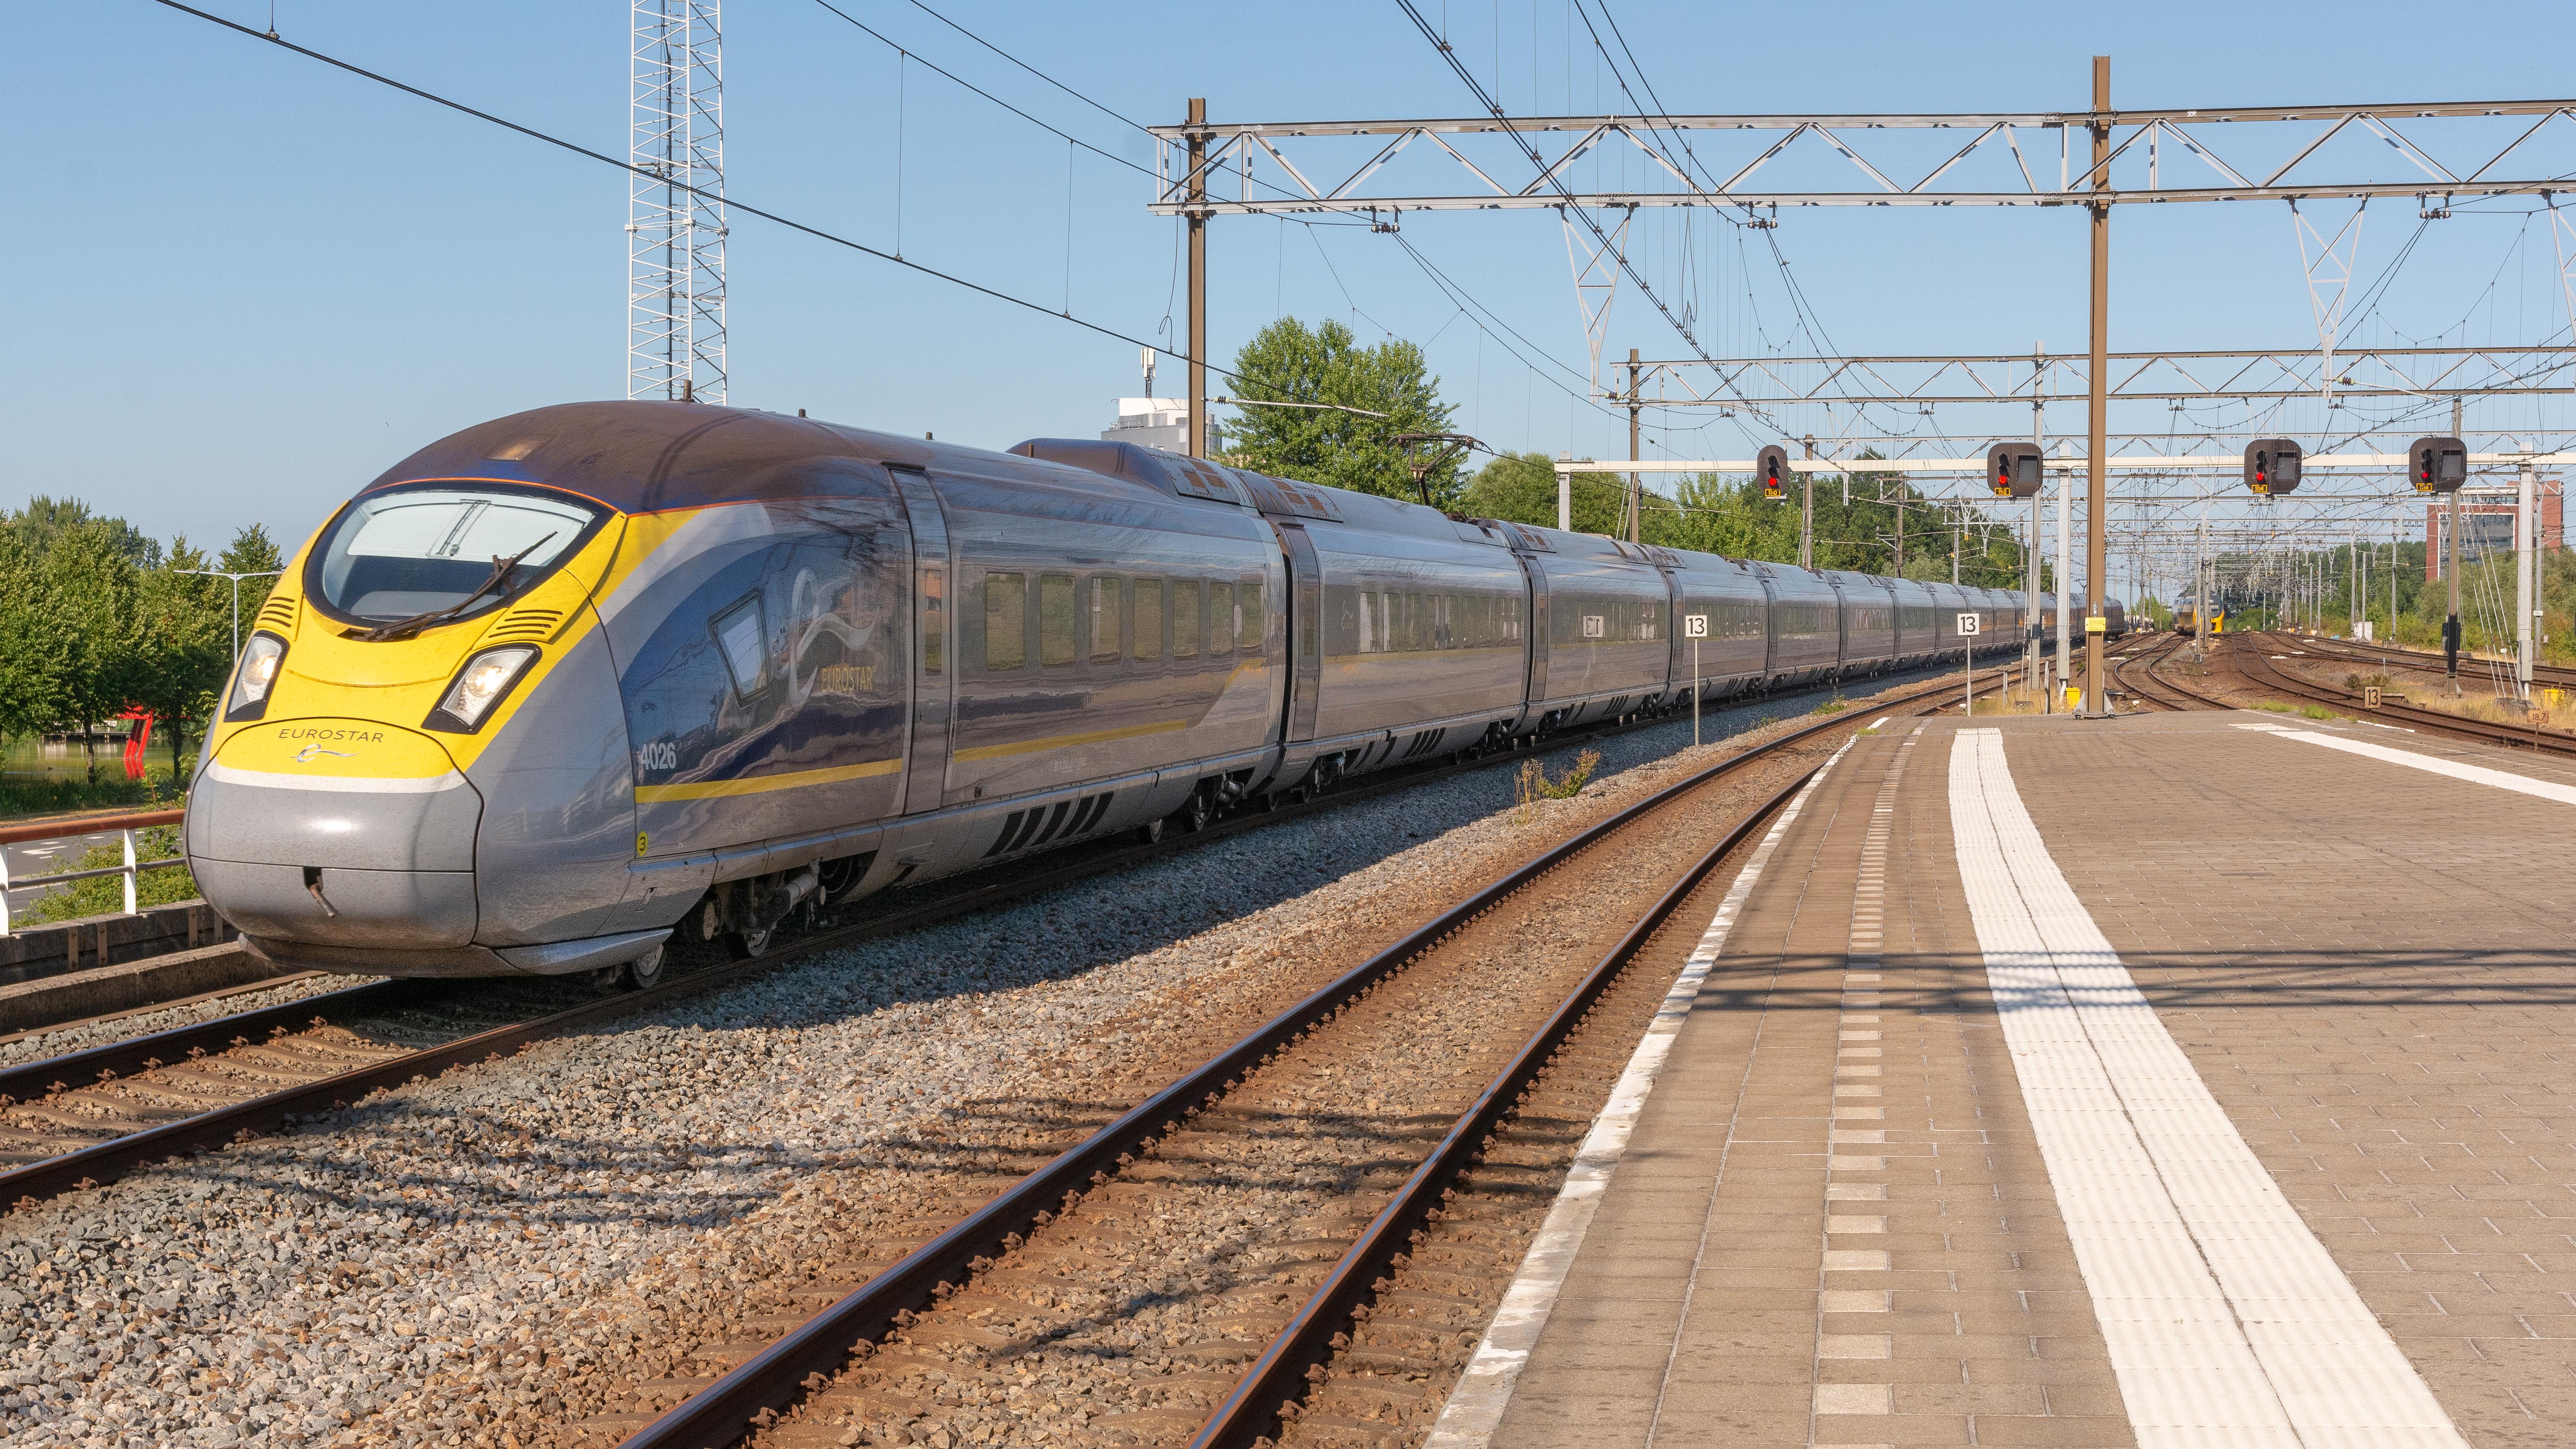 25 years of Eurostar